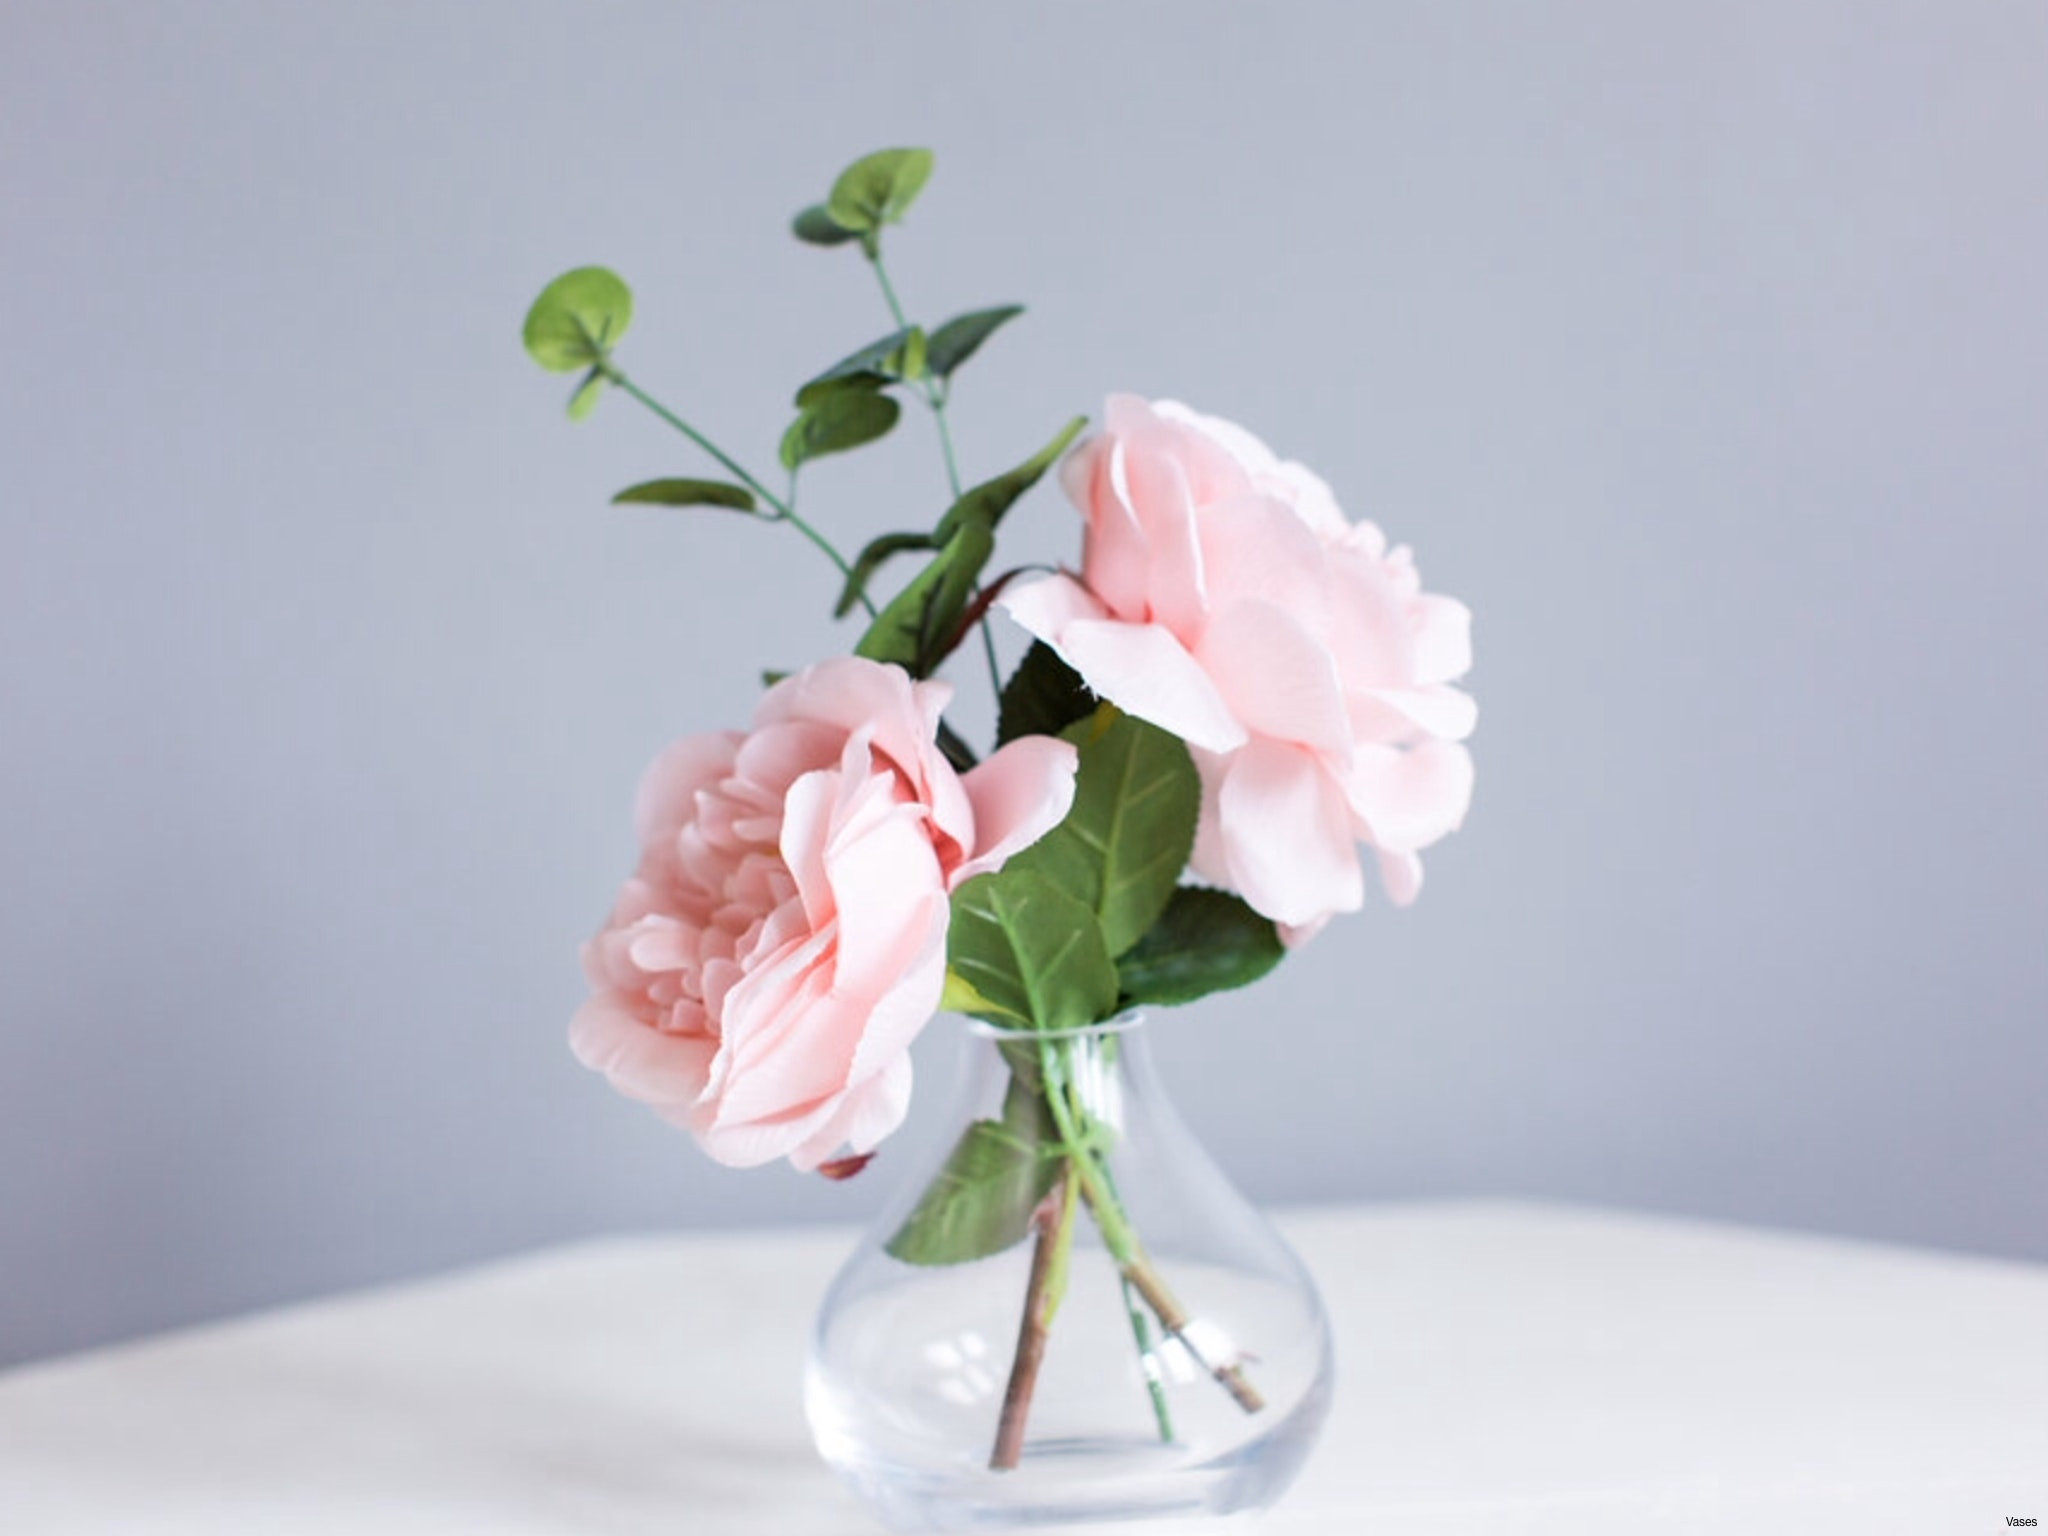 Idee Garten Einzigartig Lovely Hydrangea Flower Beautiful Flower Arrangements and